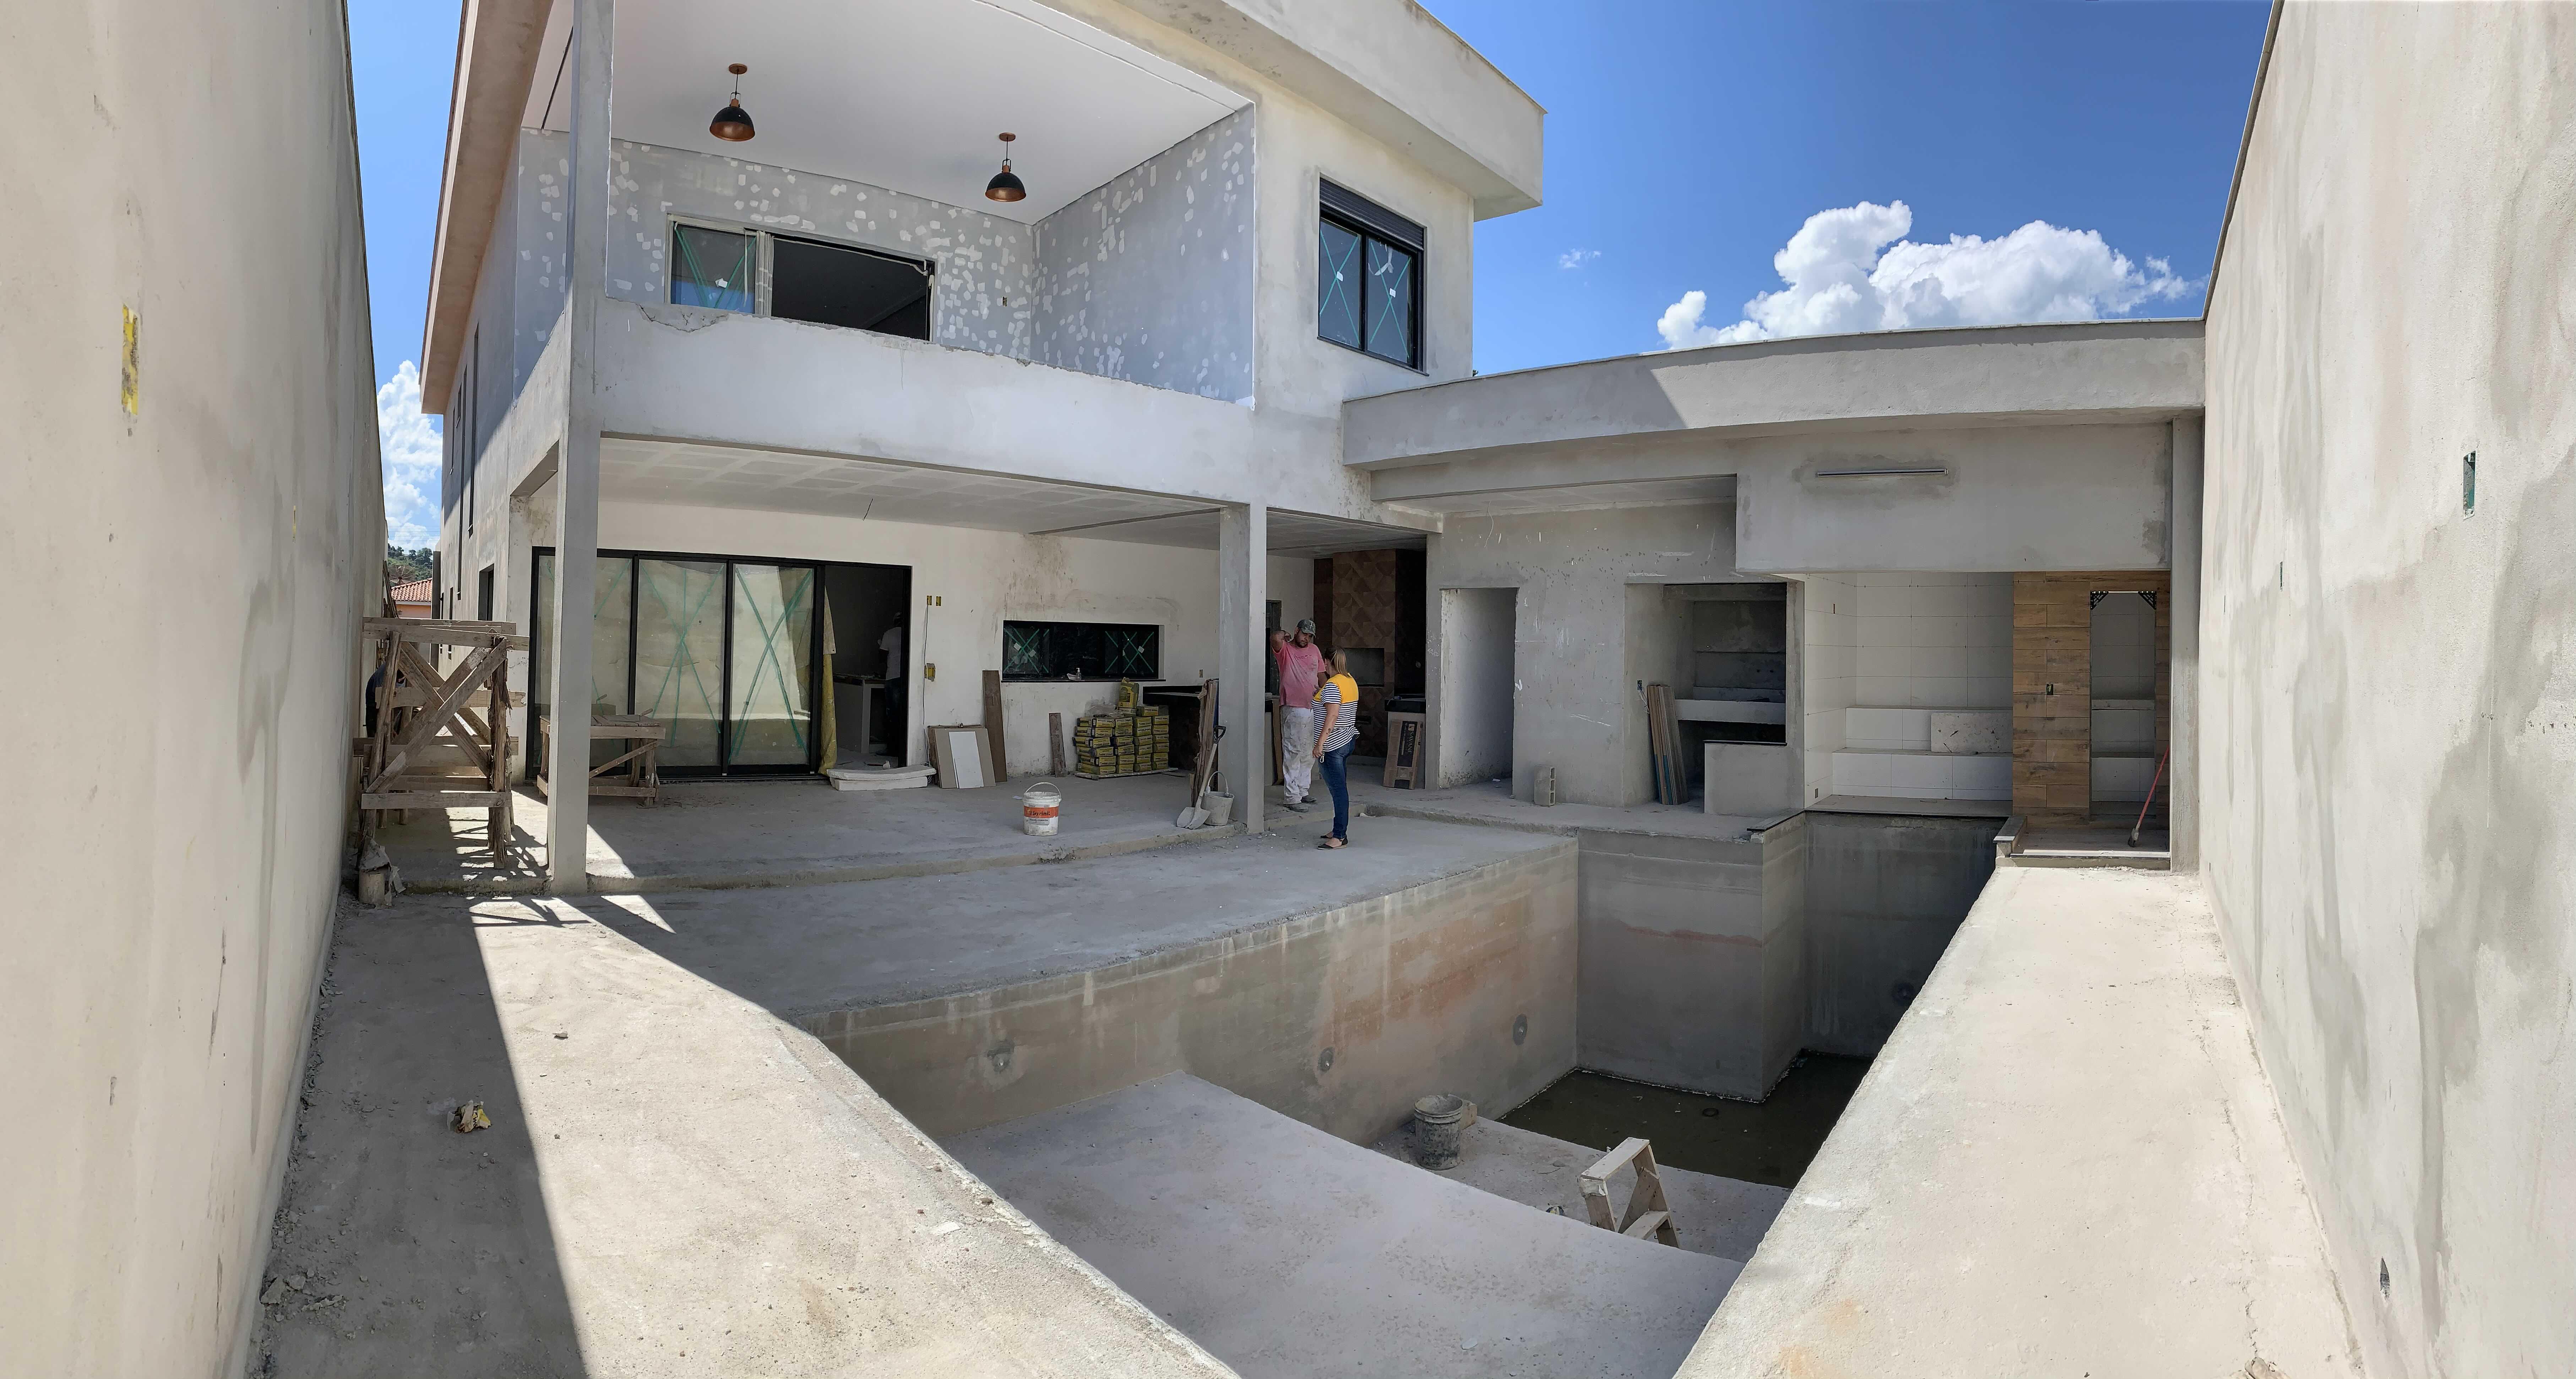 Reforma área externa, residencial.